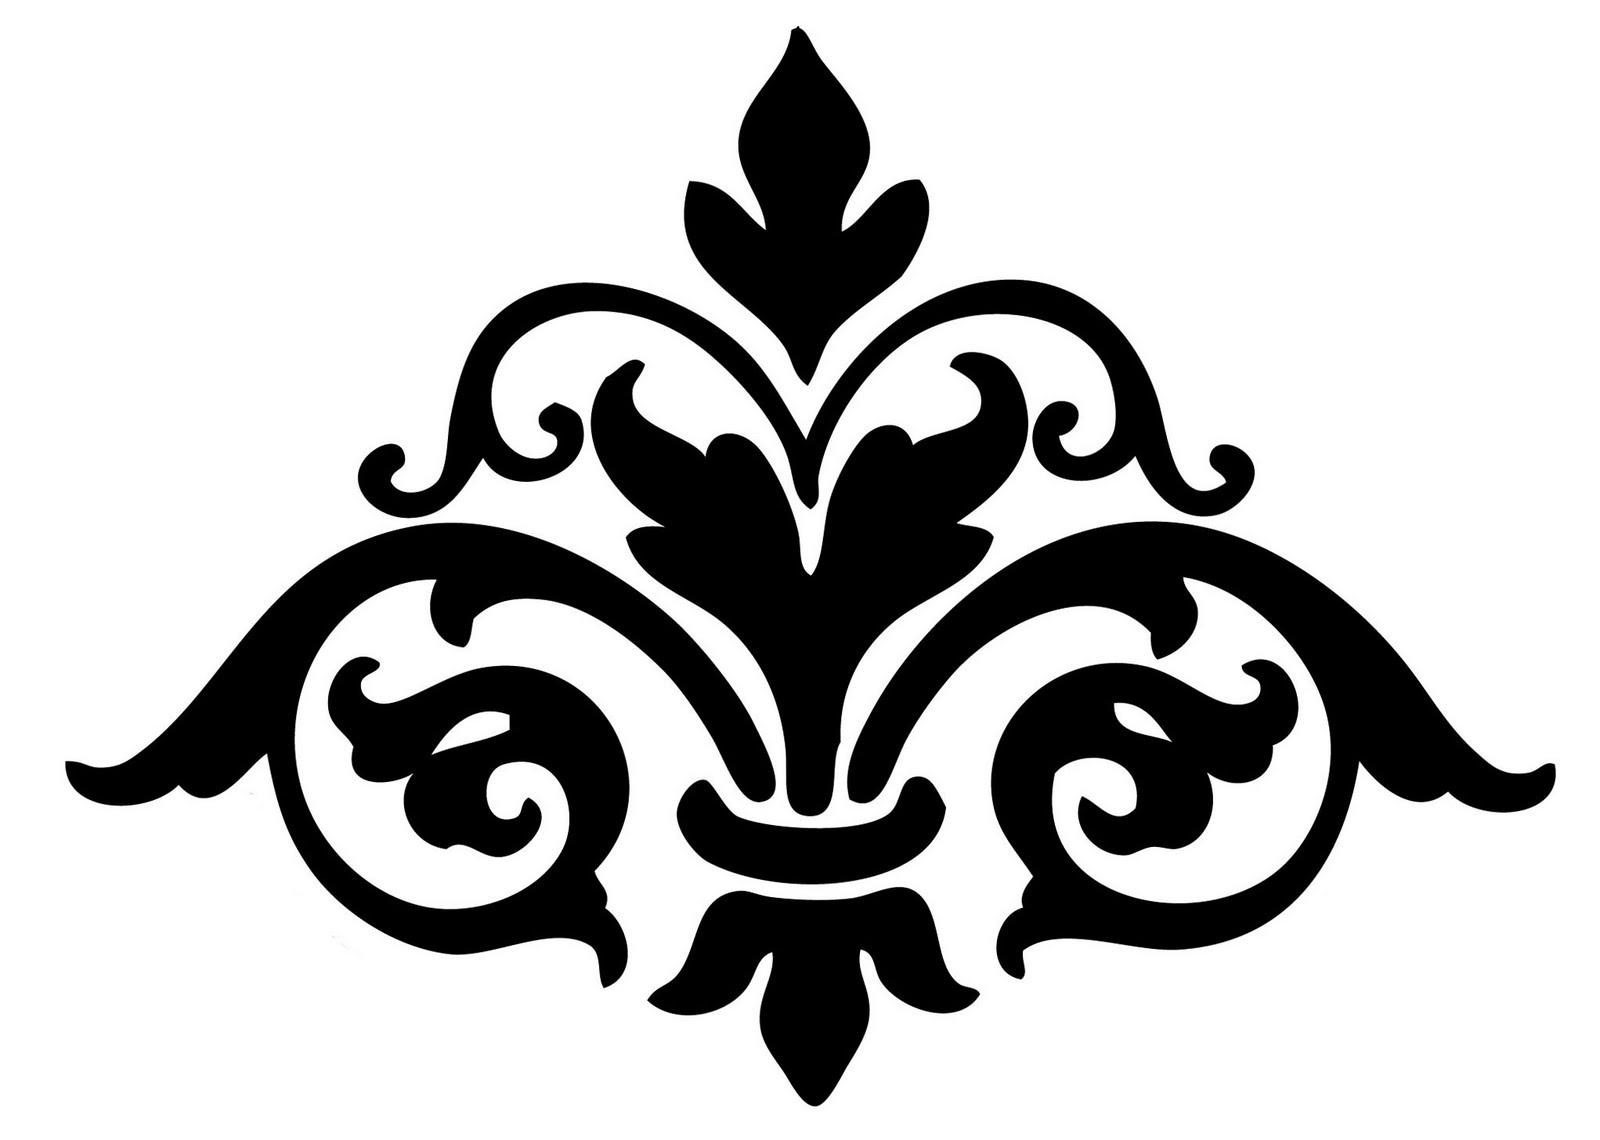 Free Printable Stencil Patterns - Clip Art Library - Free Printable Stencil Patterns